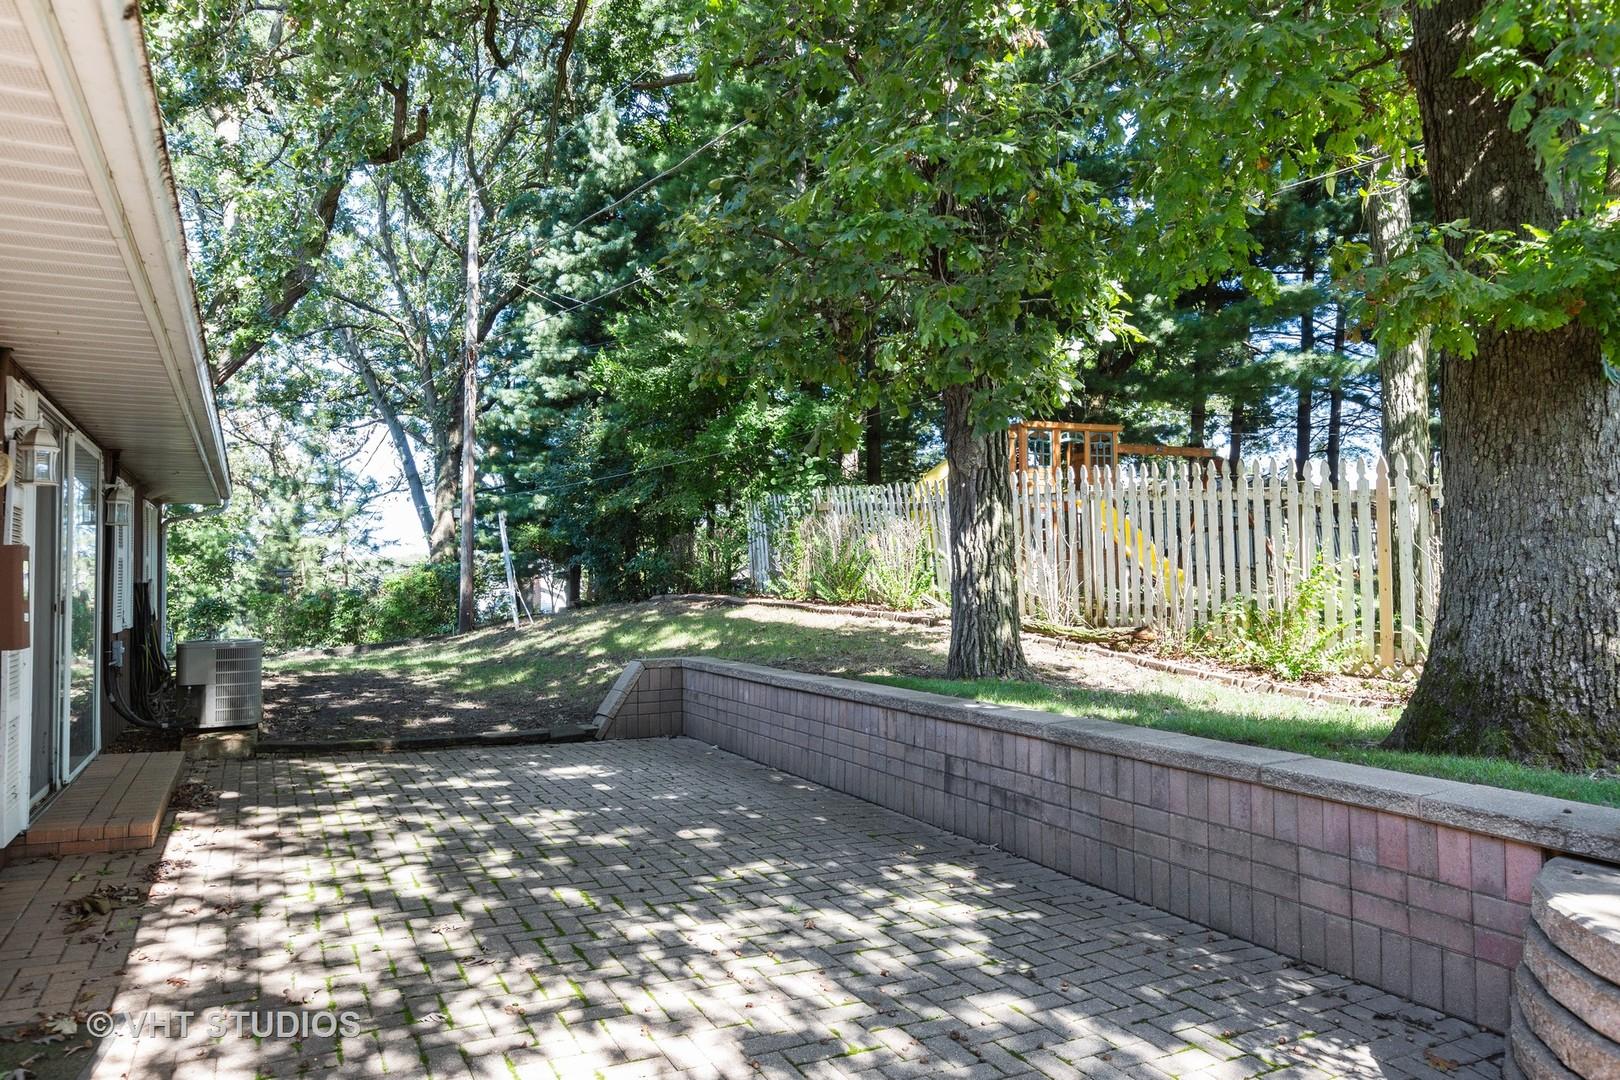 14435 Irving ,Orland Park, Illinois 60462